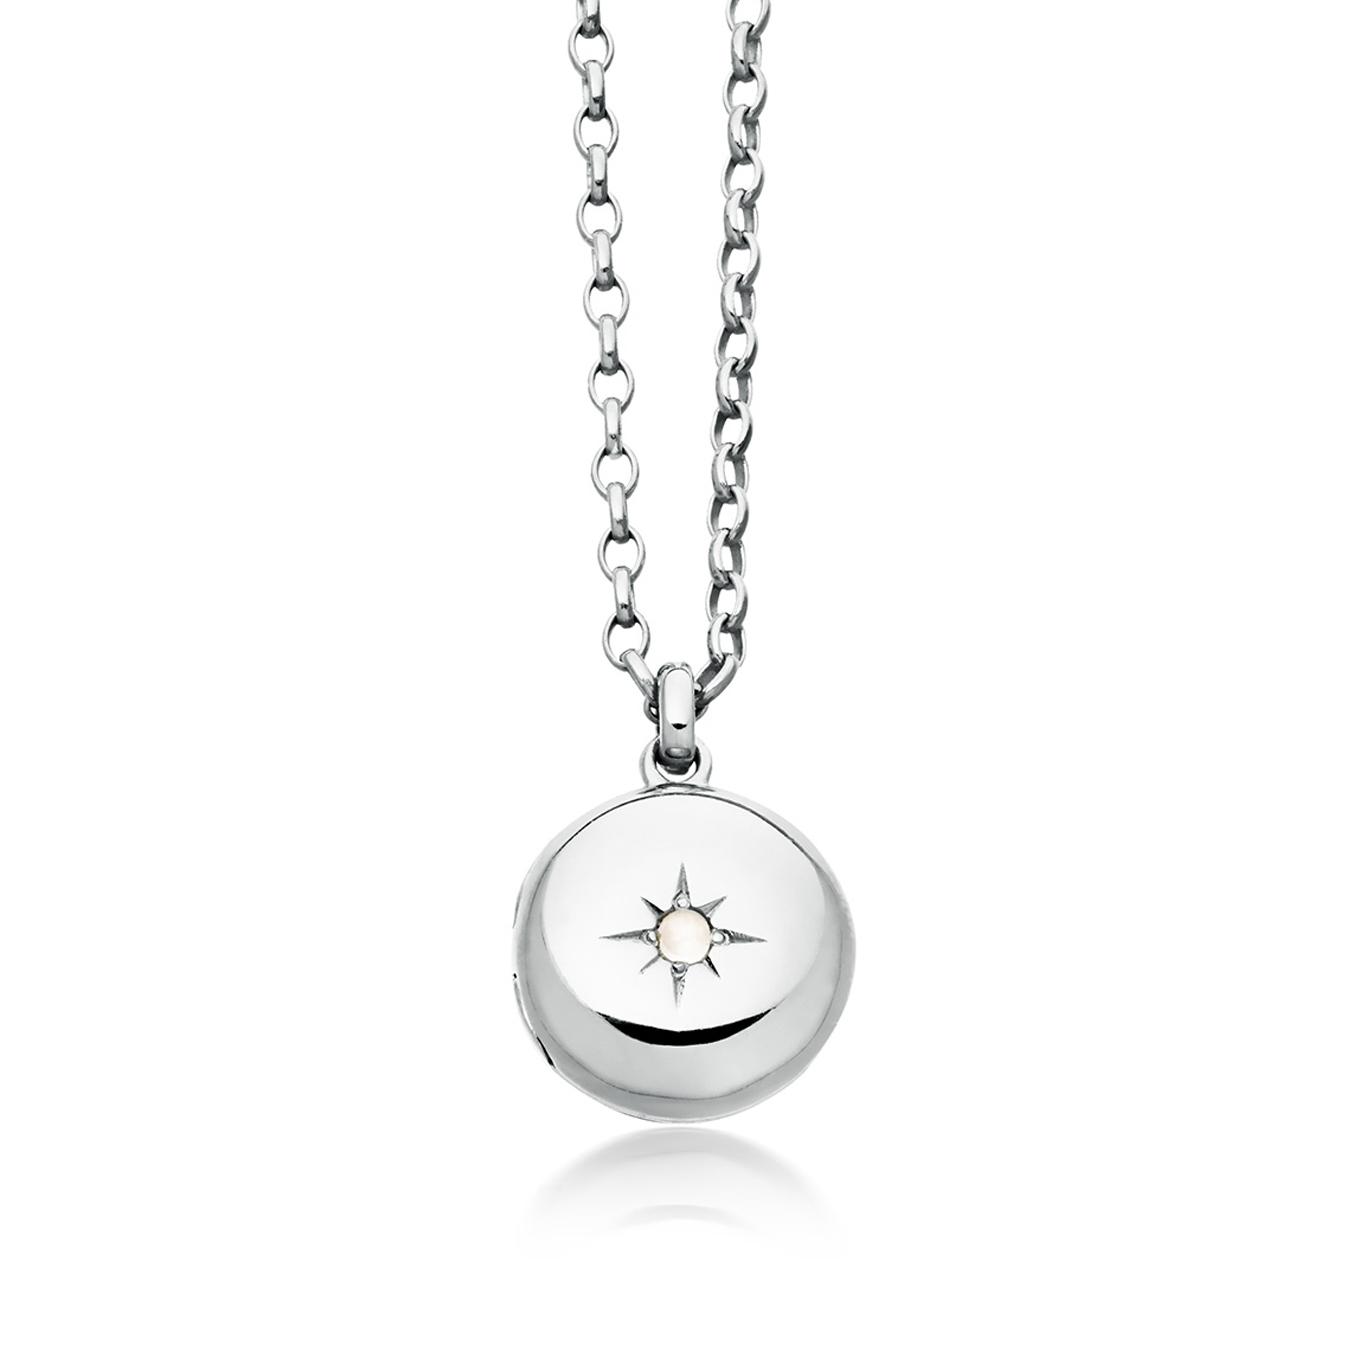 Little Astley Moonstone Locket Necklace